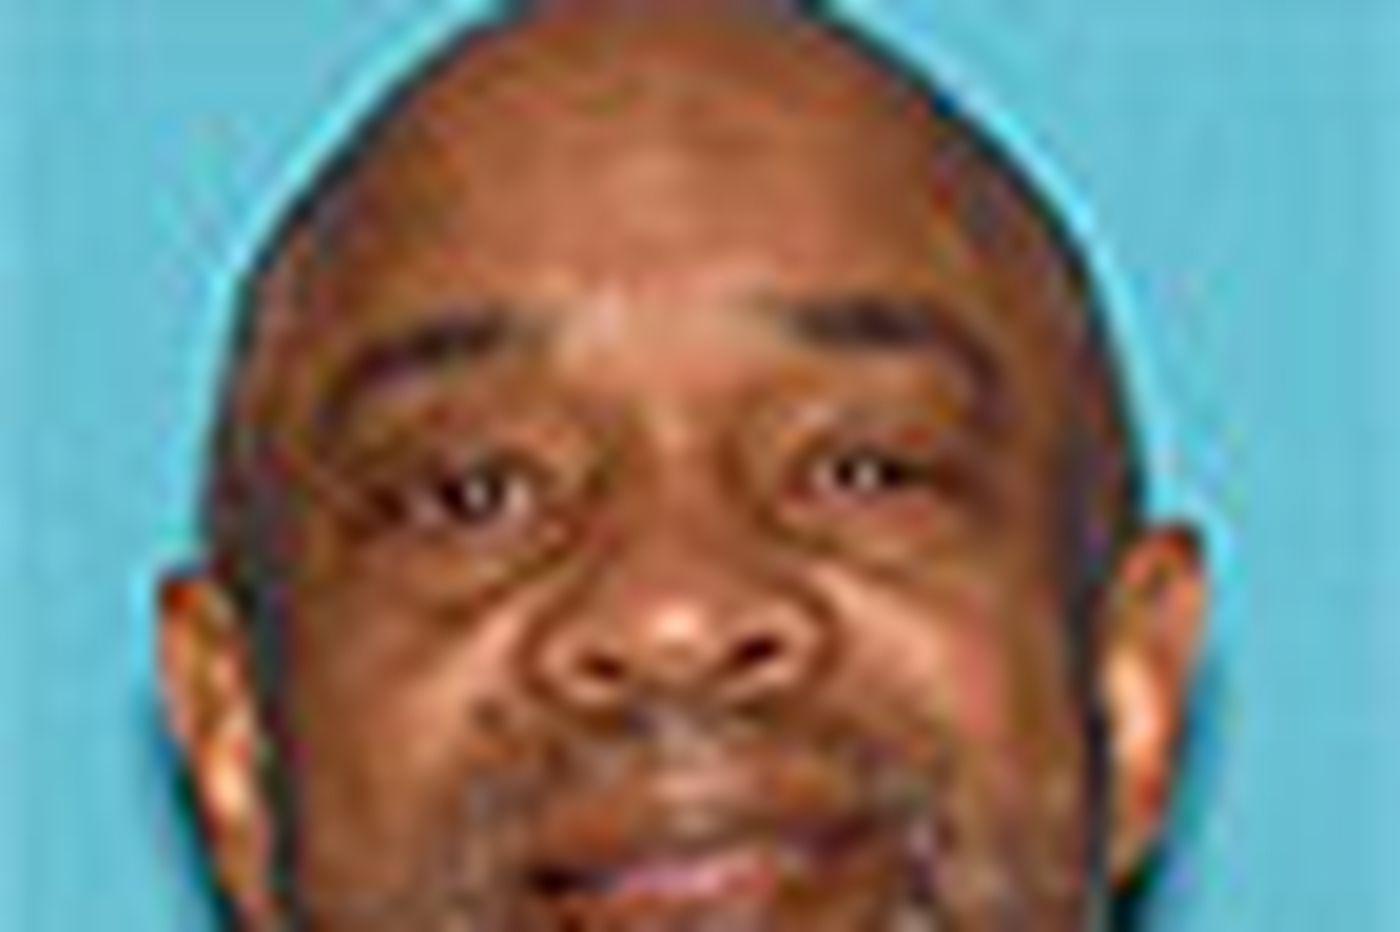 Alzheimer's patient missing in Camden County